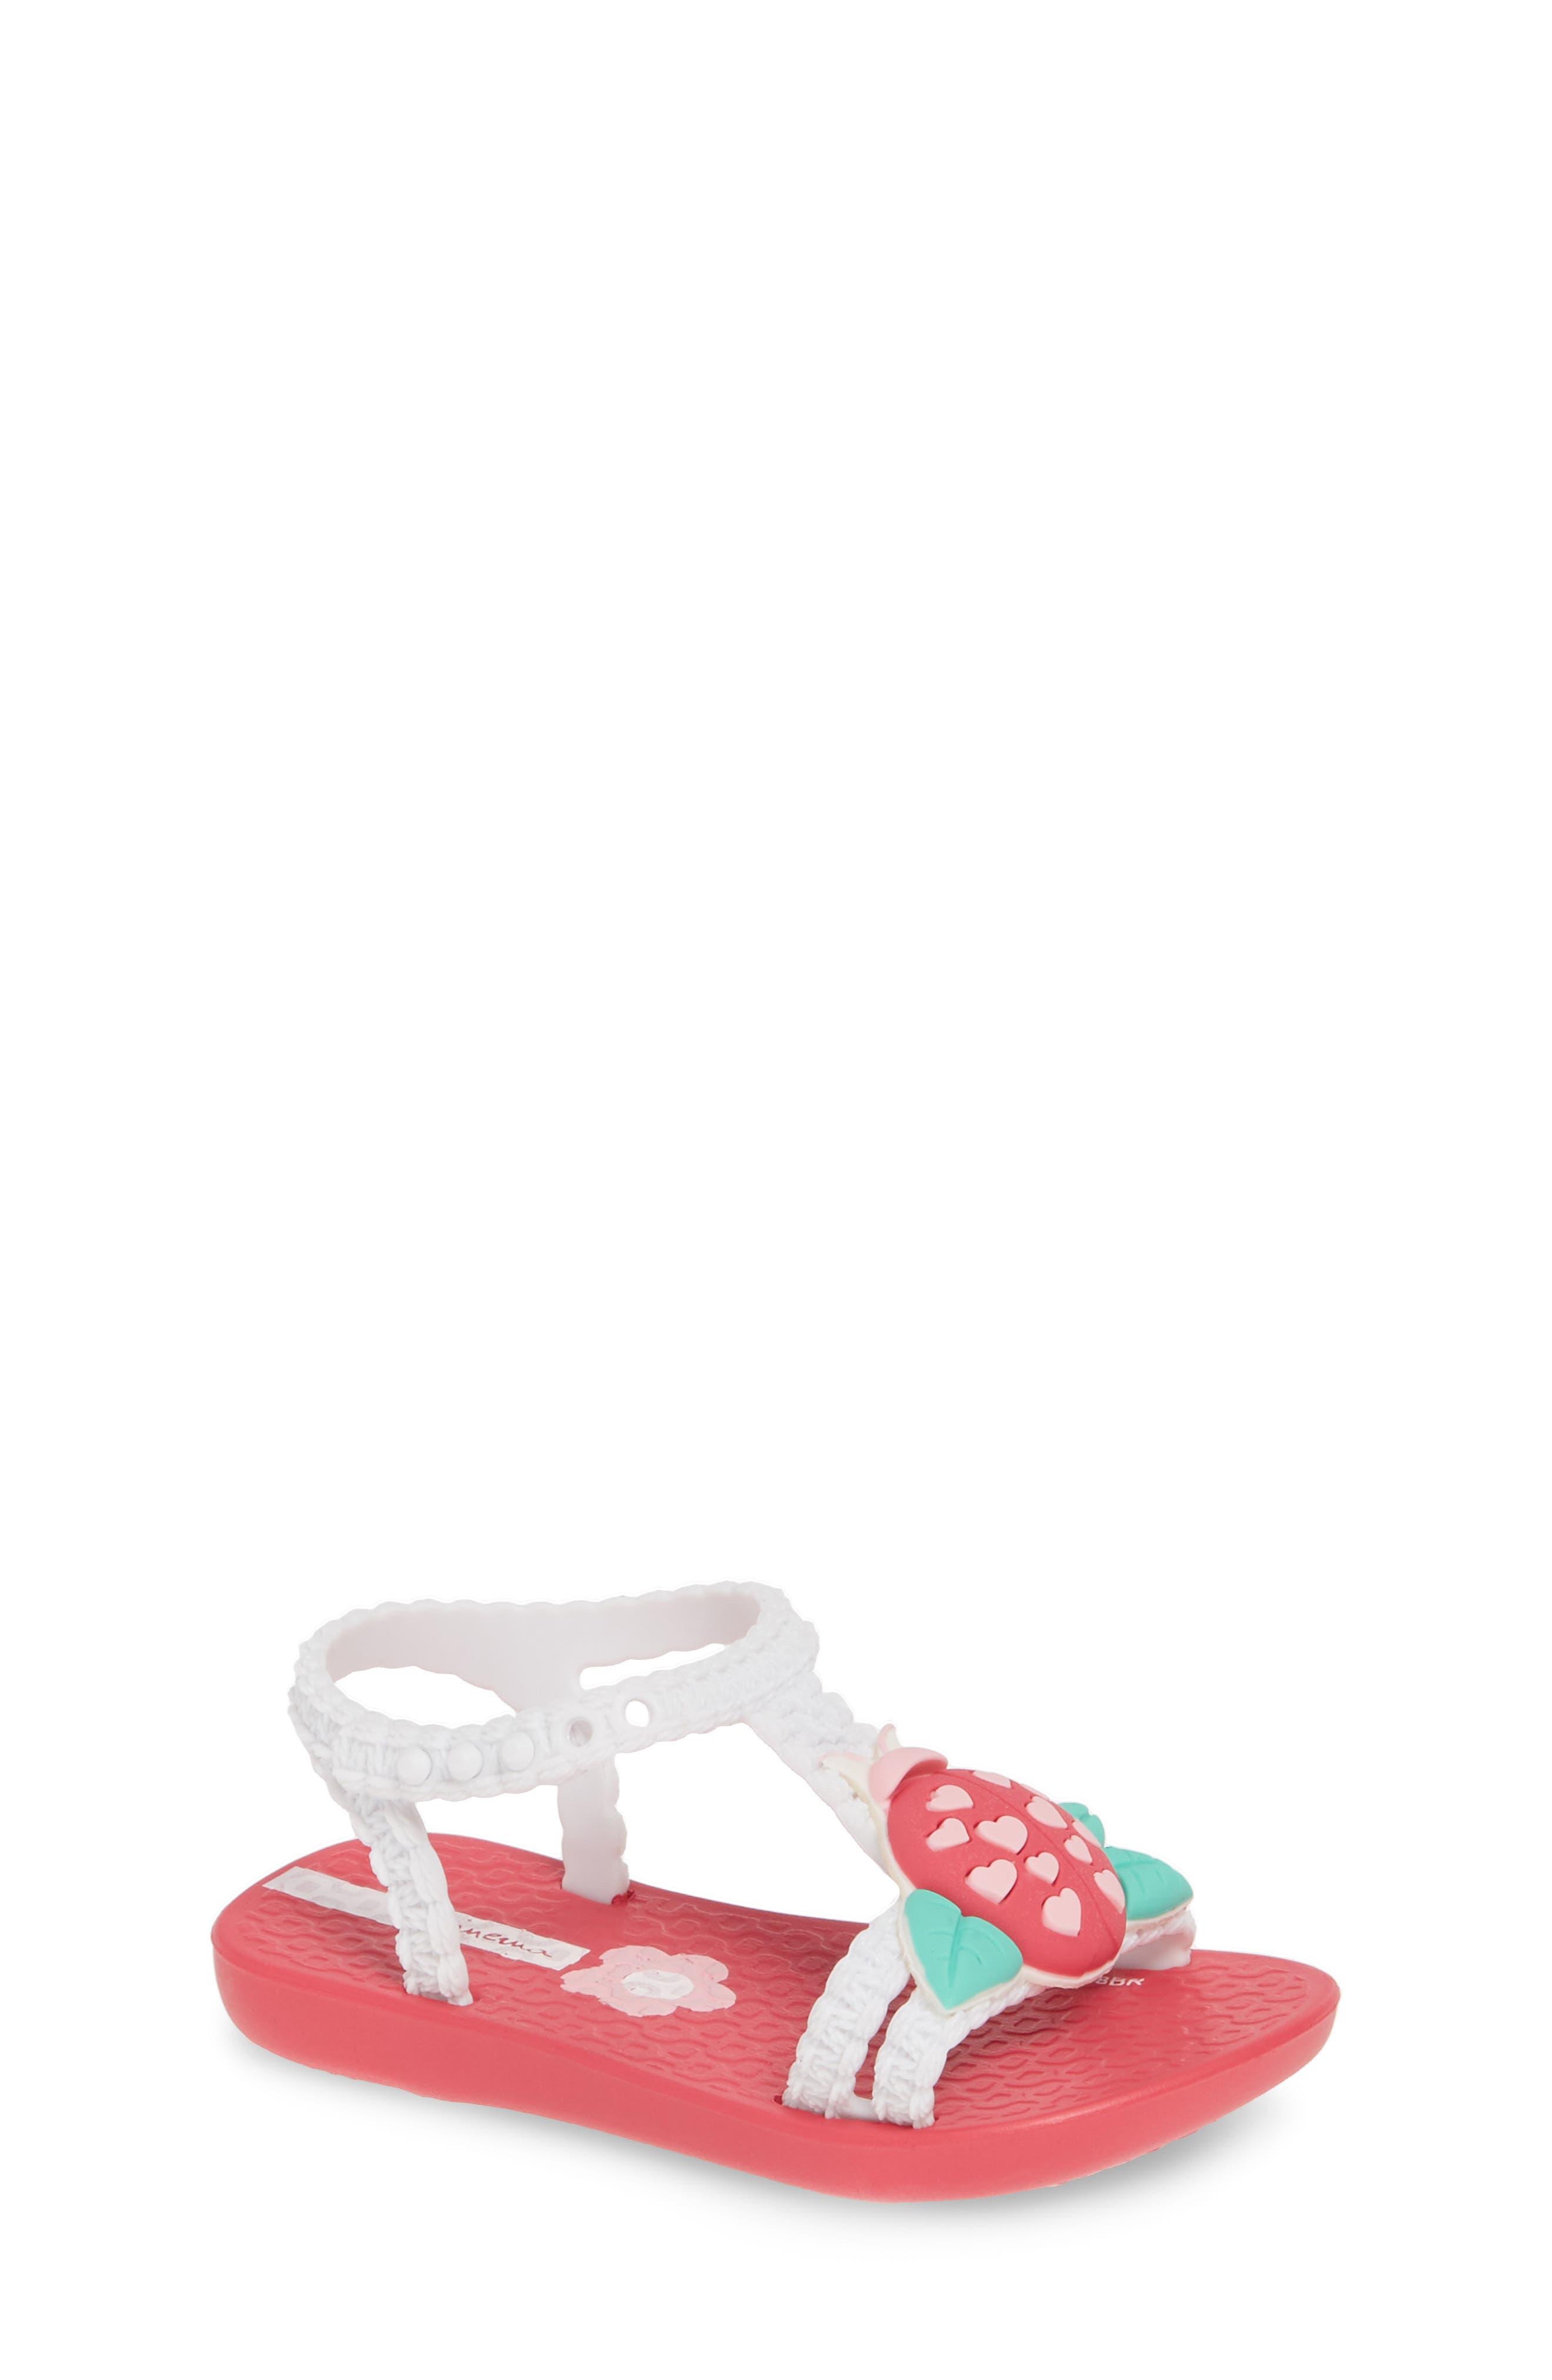 IPANEMA, Buggy Baby Sandal, Main thumbnail 1, color, PINK/ WHITE